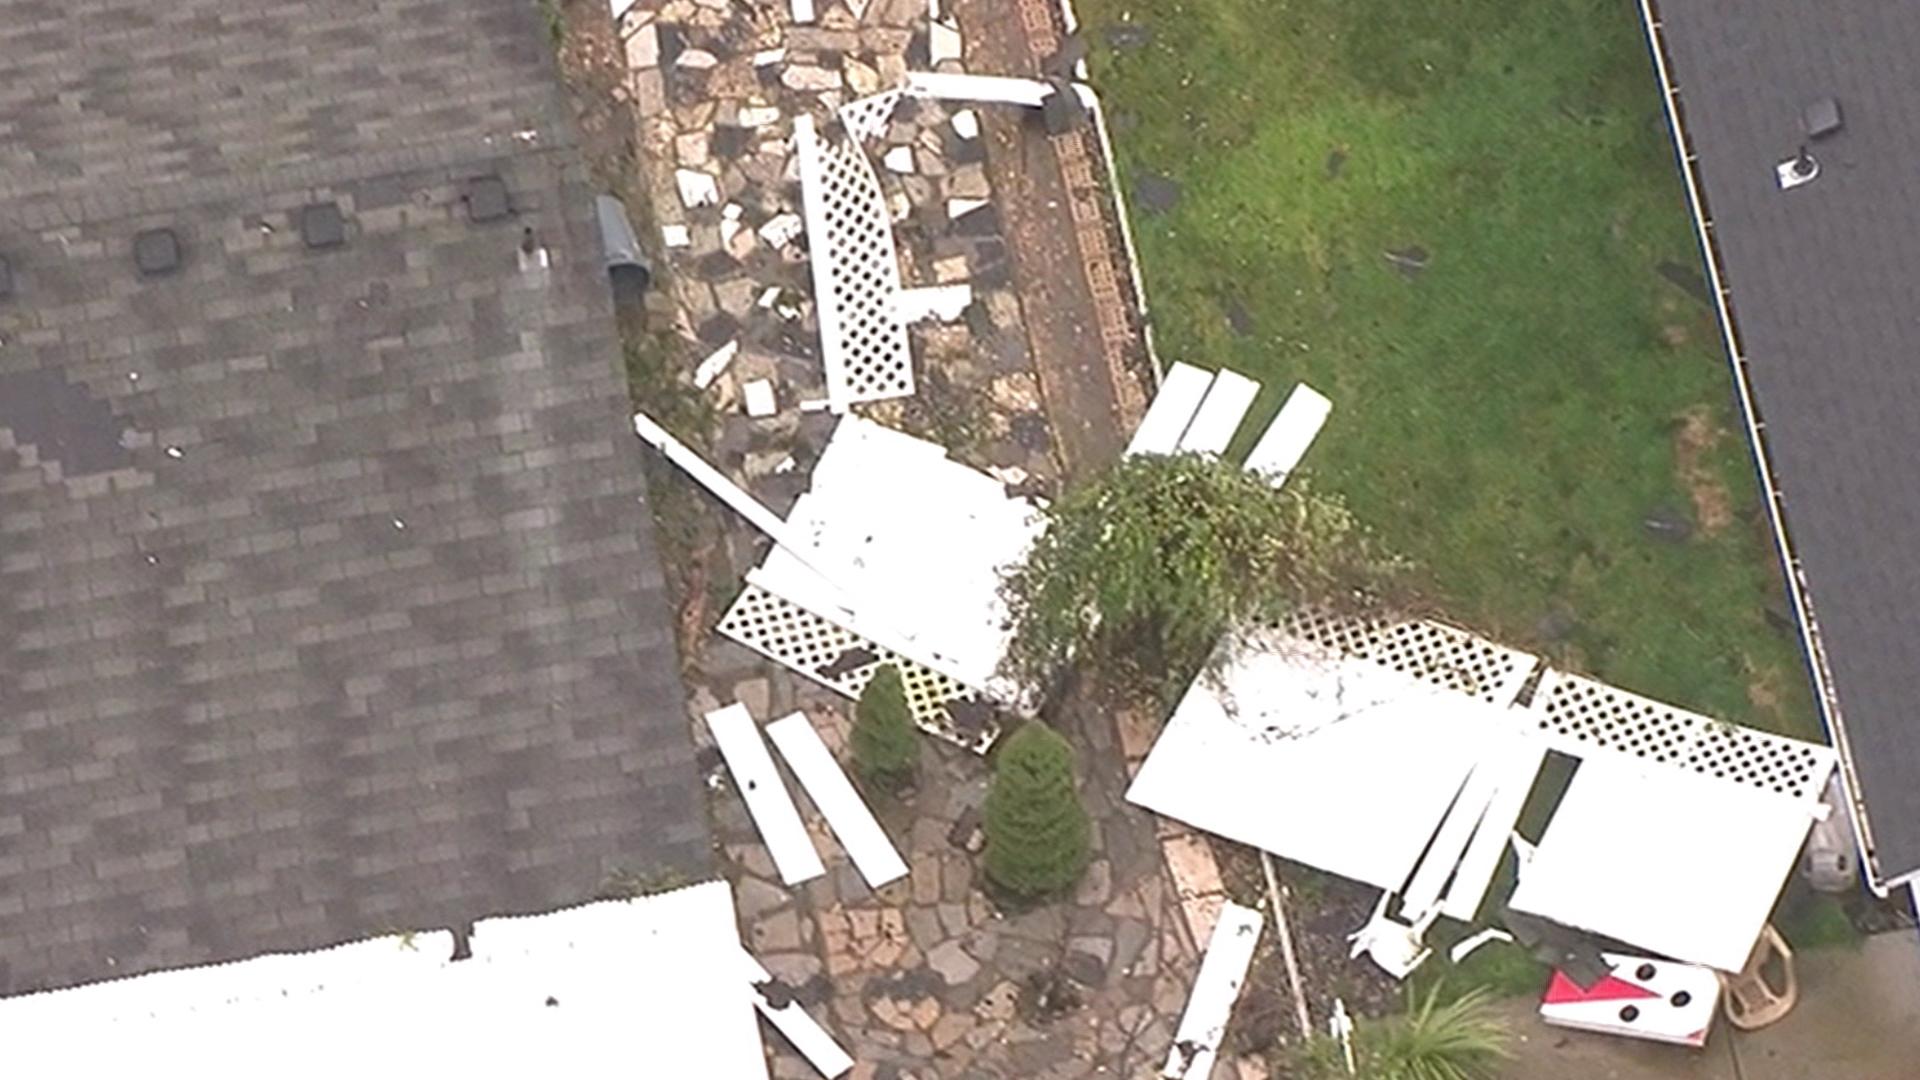 Graham Wa Weather >> Tornado Touches Down In Washington State Nbc News